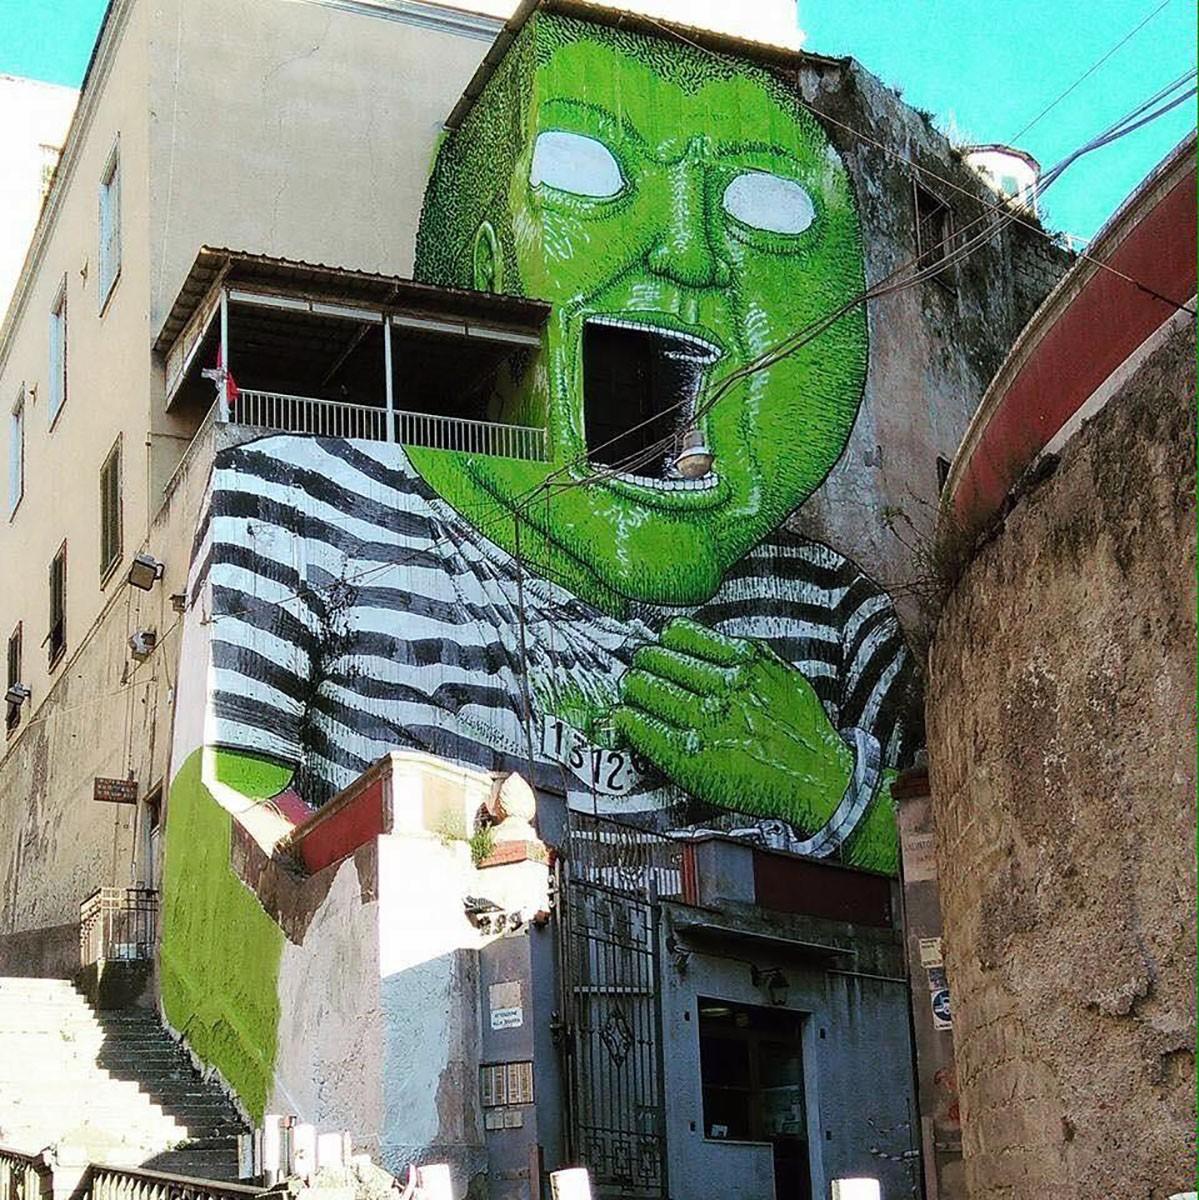 blu_napoli_streetartnews-1